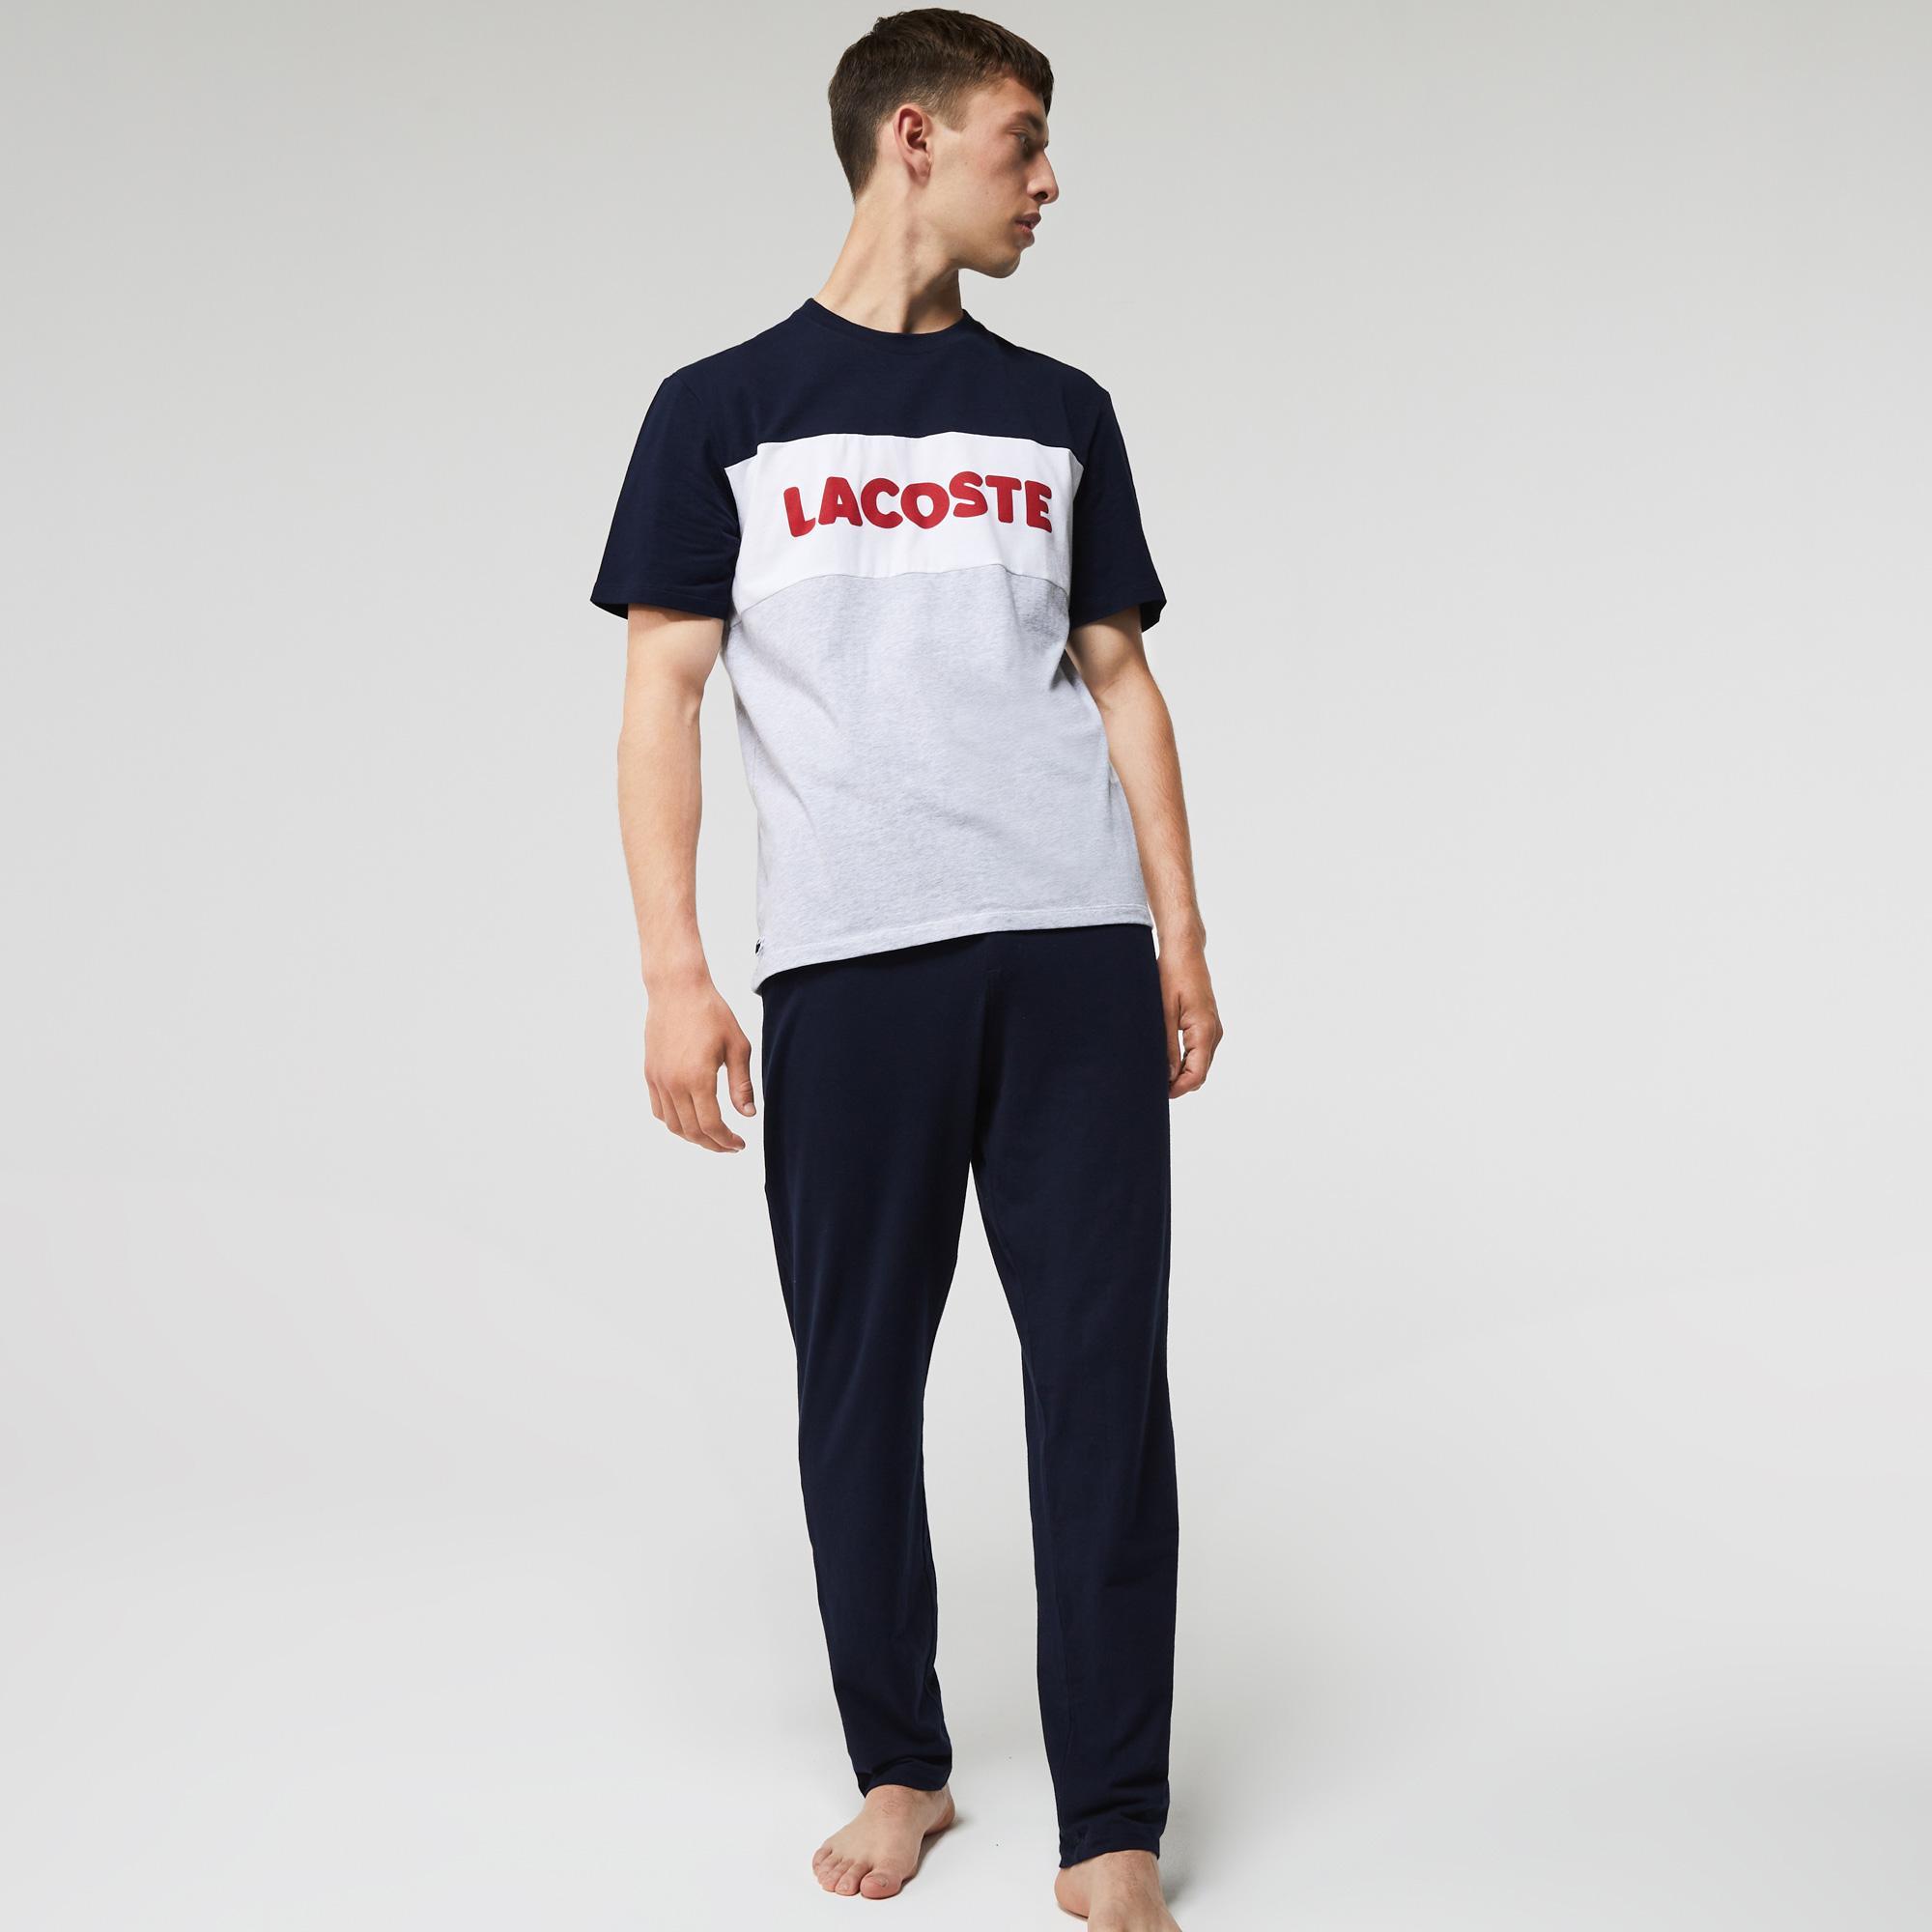 Lacoste Pyjamas men